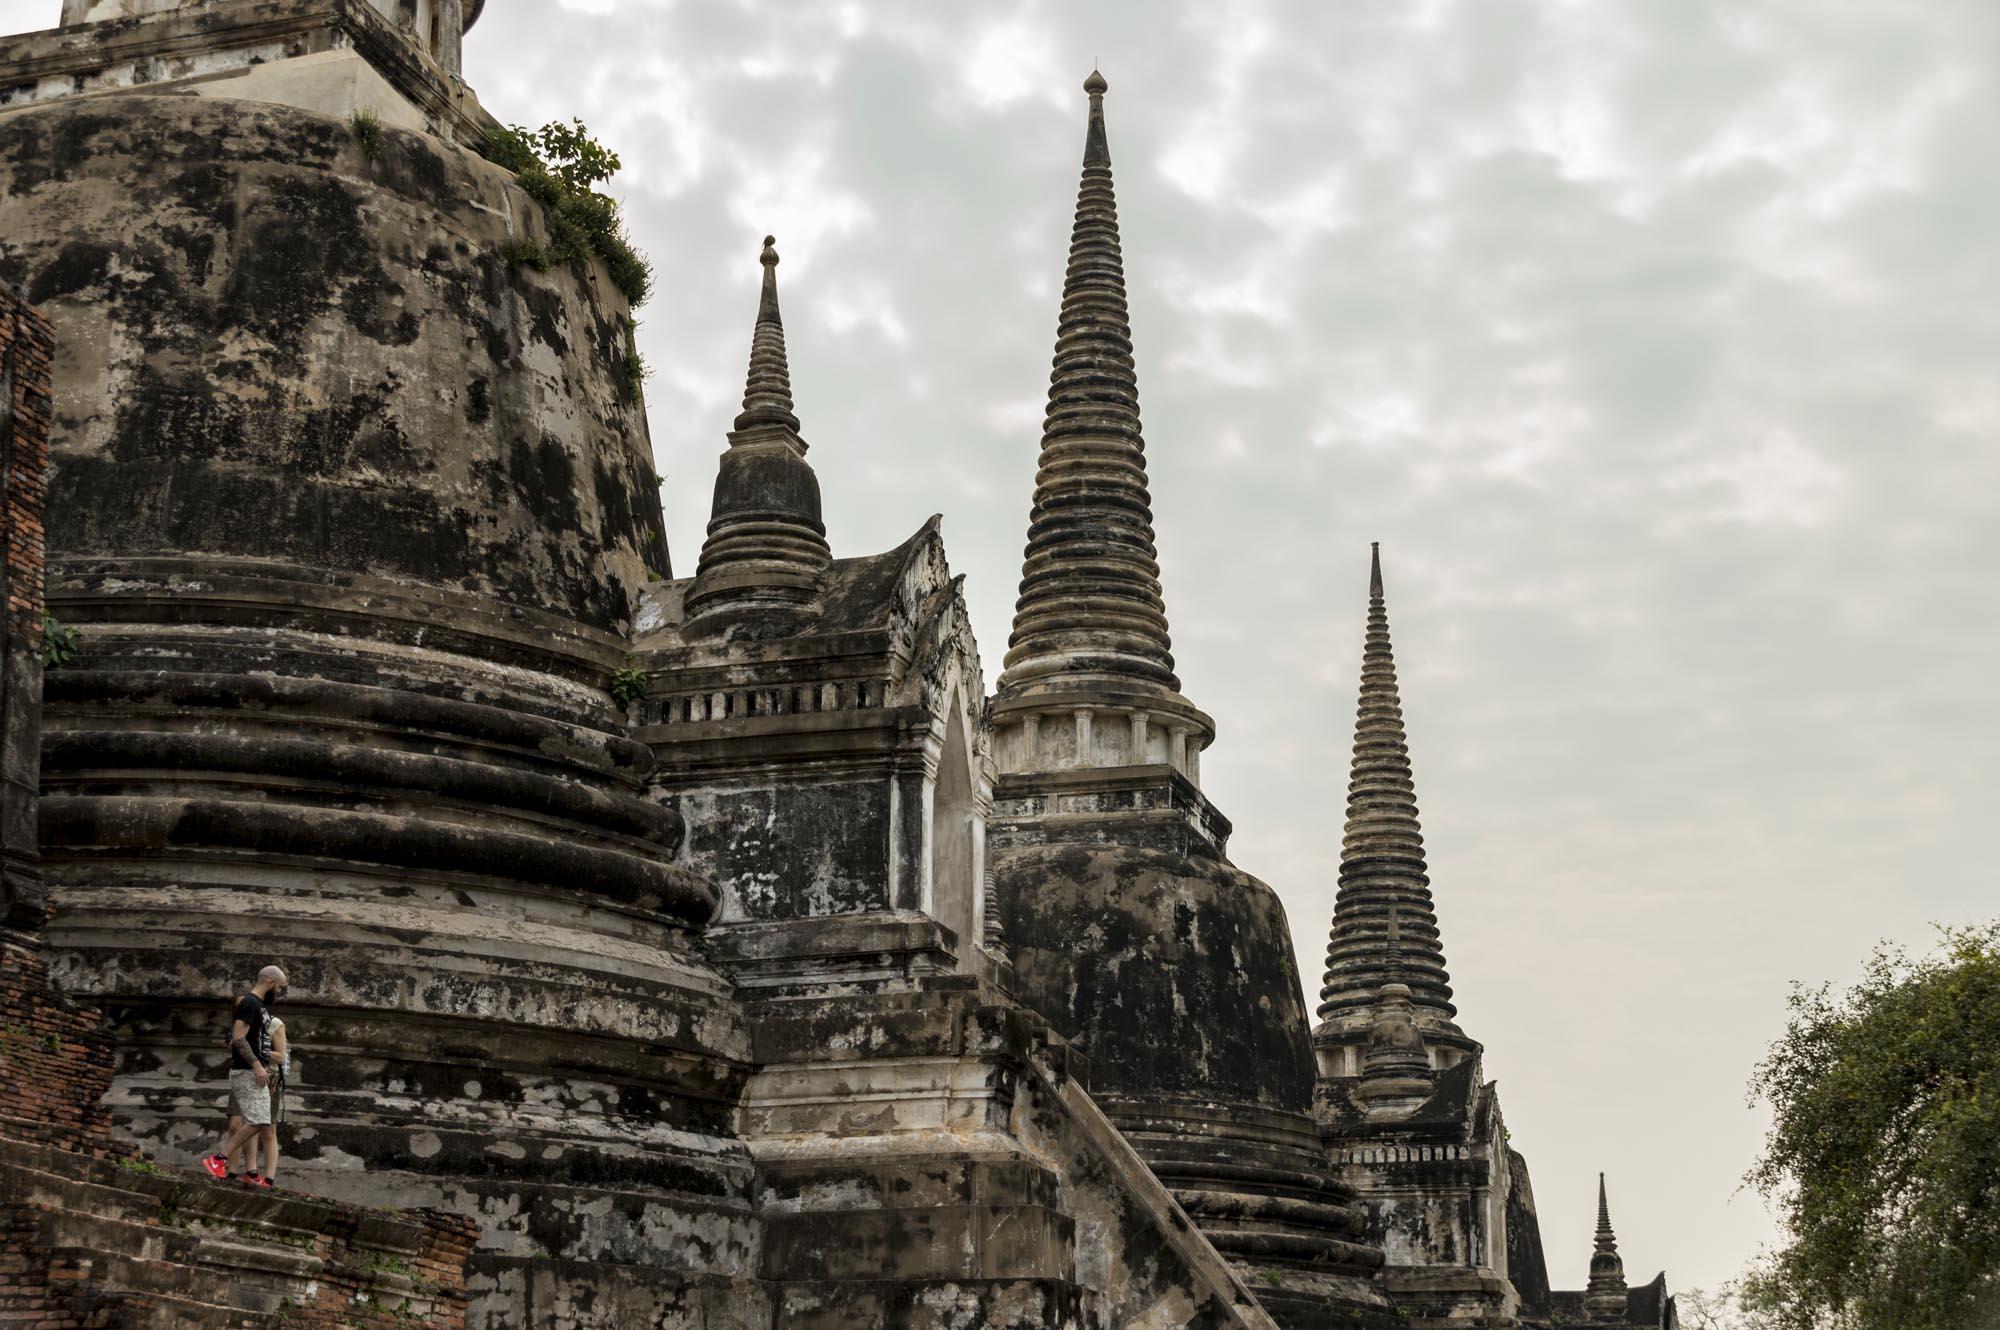 Ayutthaya Wat Phra Si Sanphet